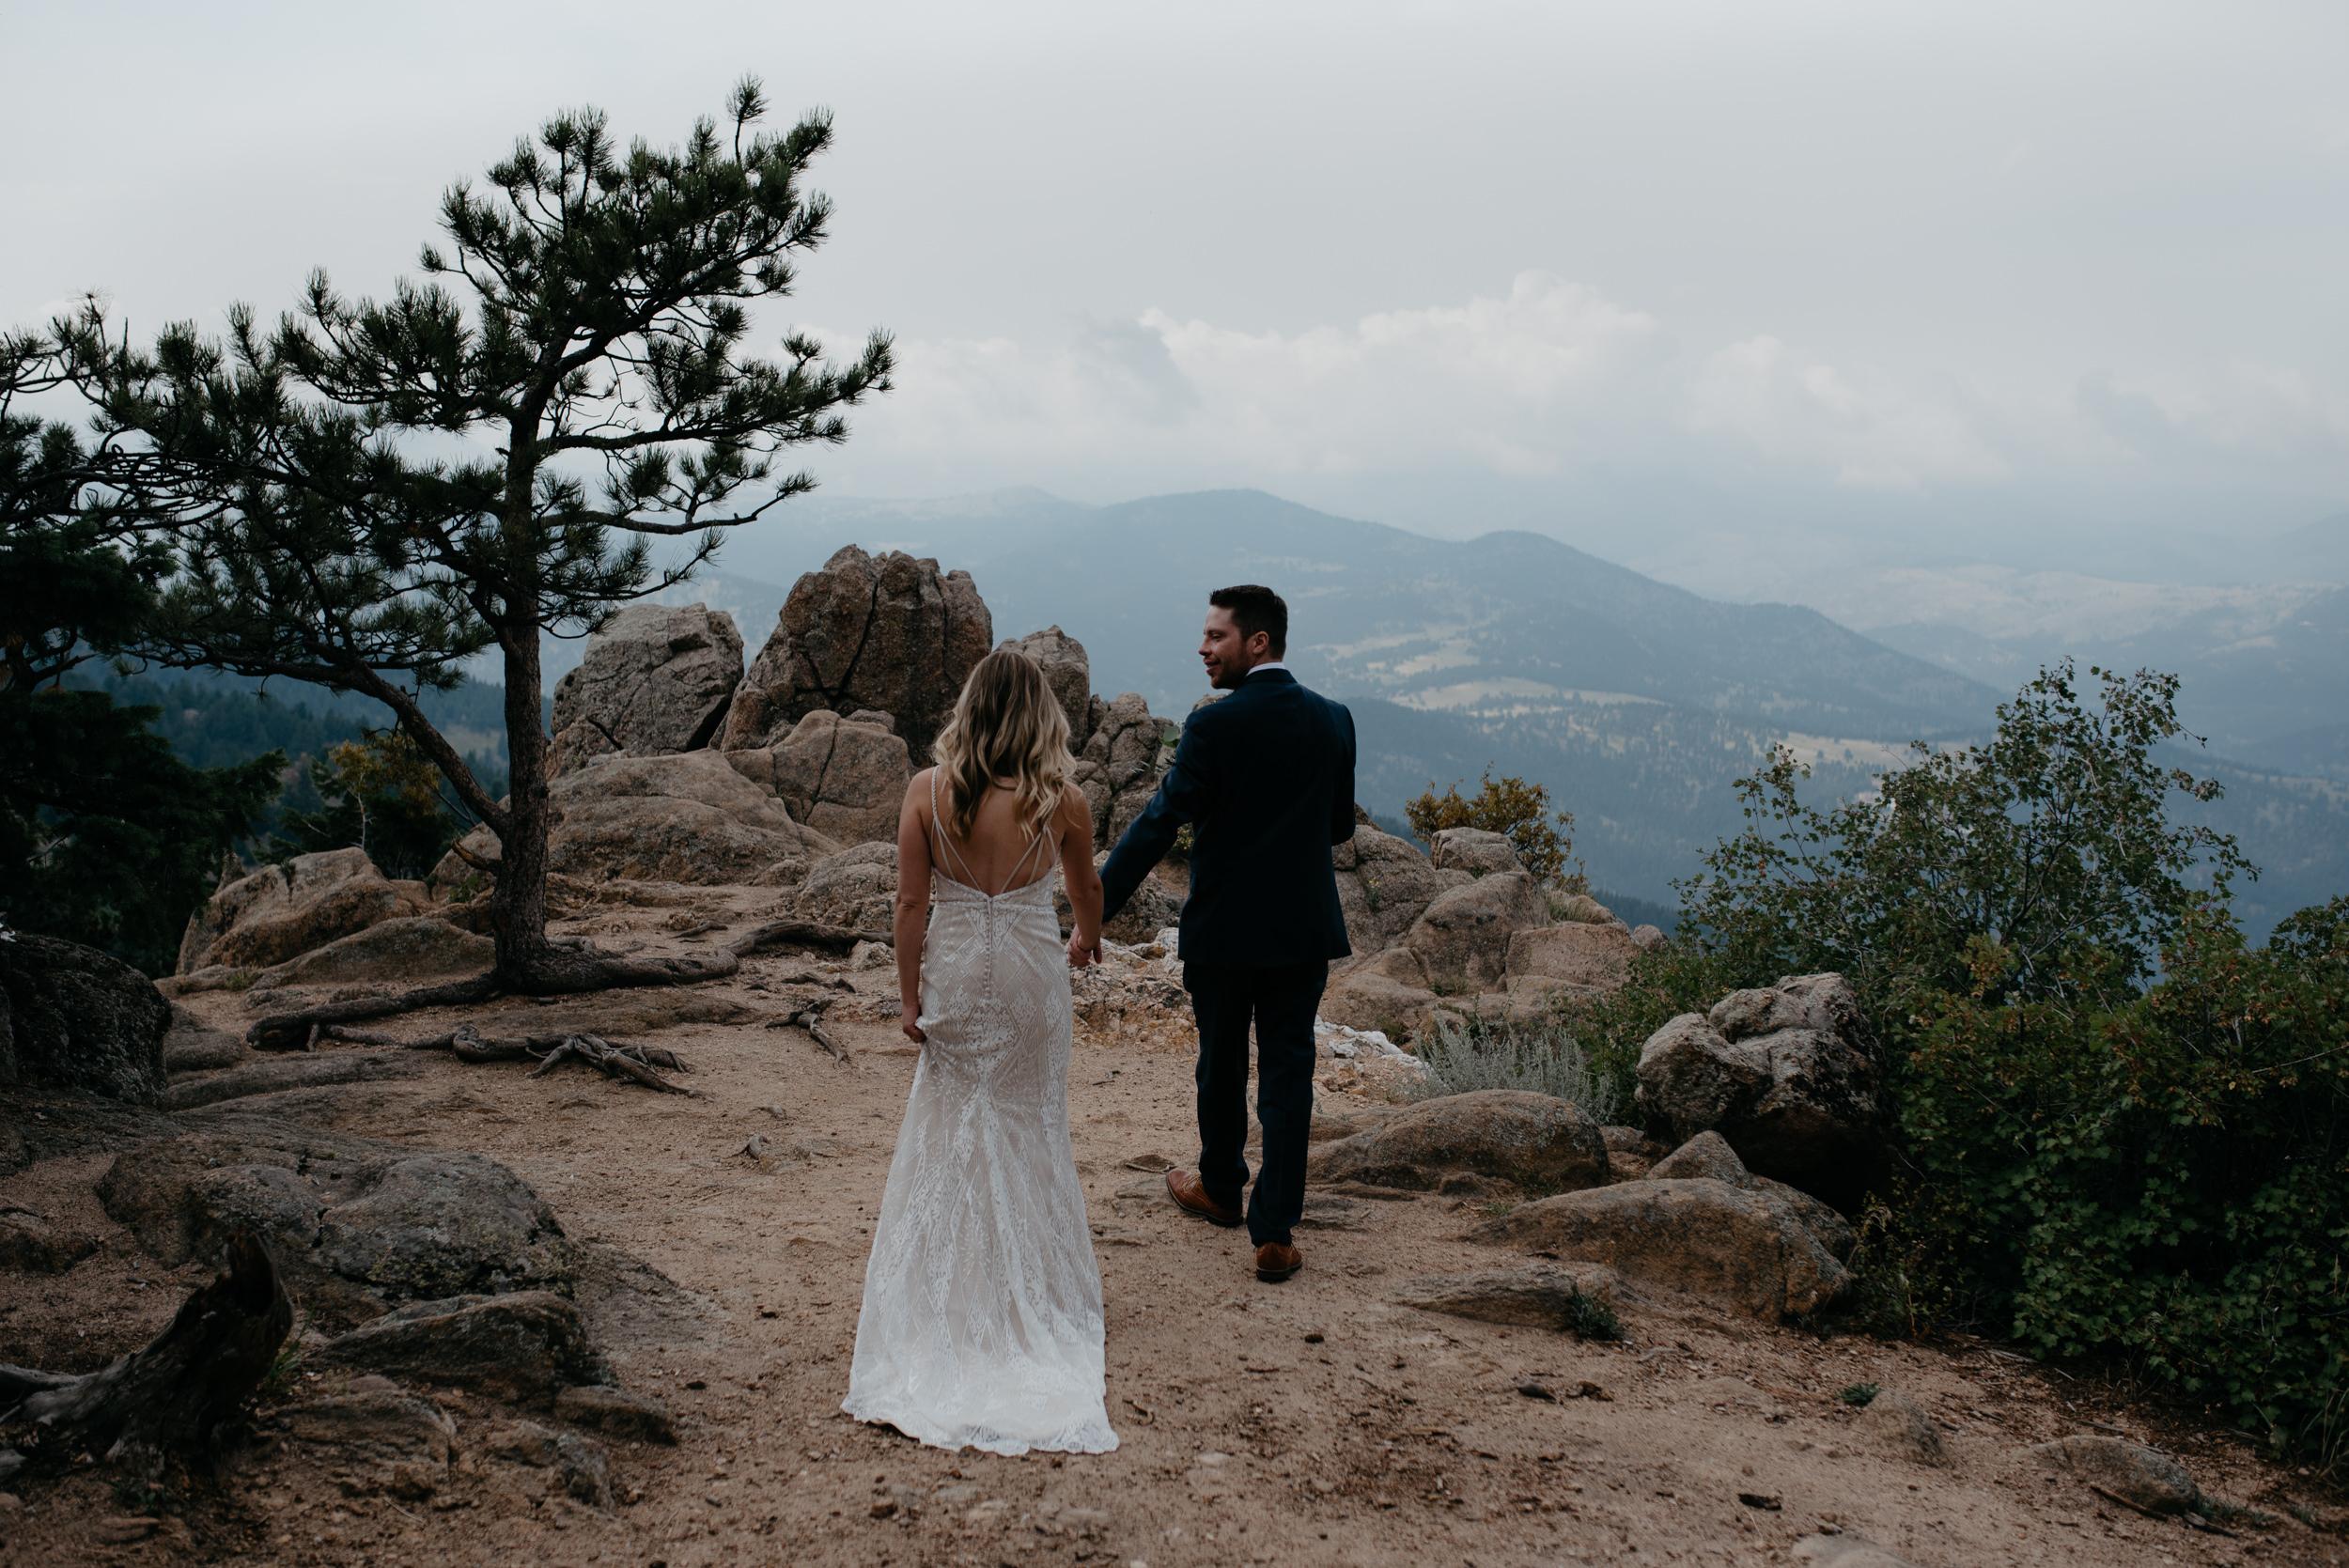 Boulder, Colorado adventure wedding and elopement photographer. Mountain elopement at Lost Gulch.